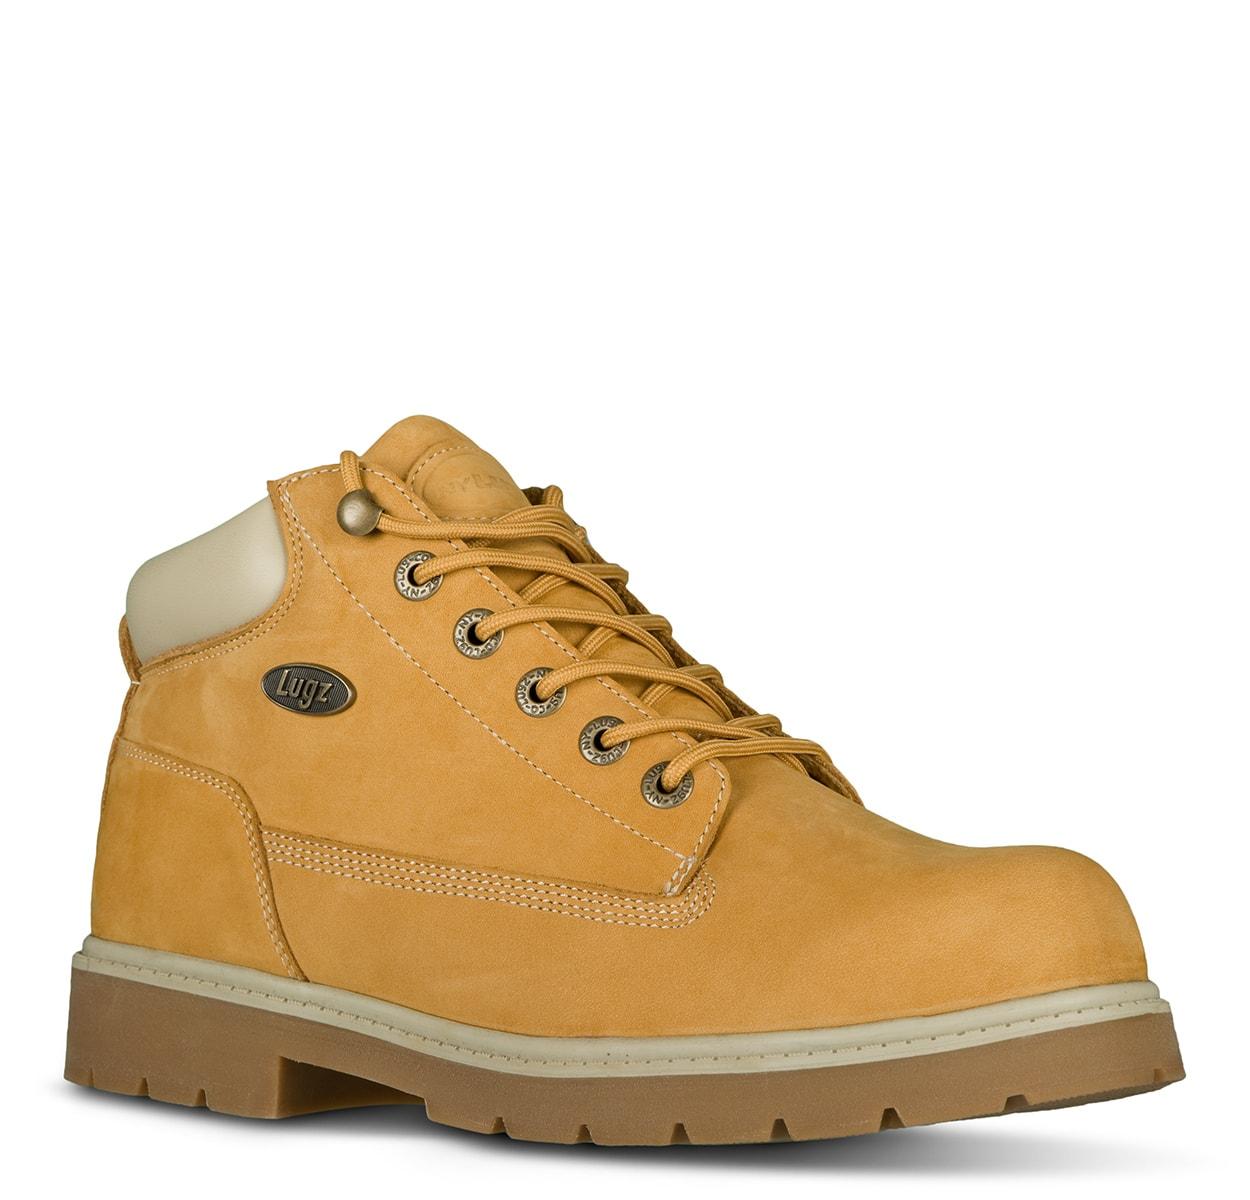 Men's Drifter Lx Chukka Boot (Choose Your Color: Golden Wheat/Cream/Gum, Choose Your Size: 11.5)